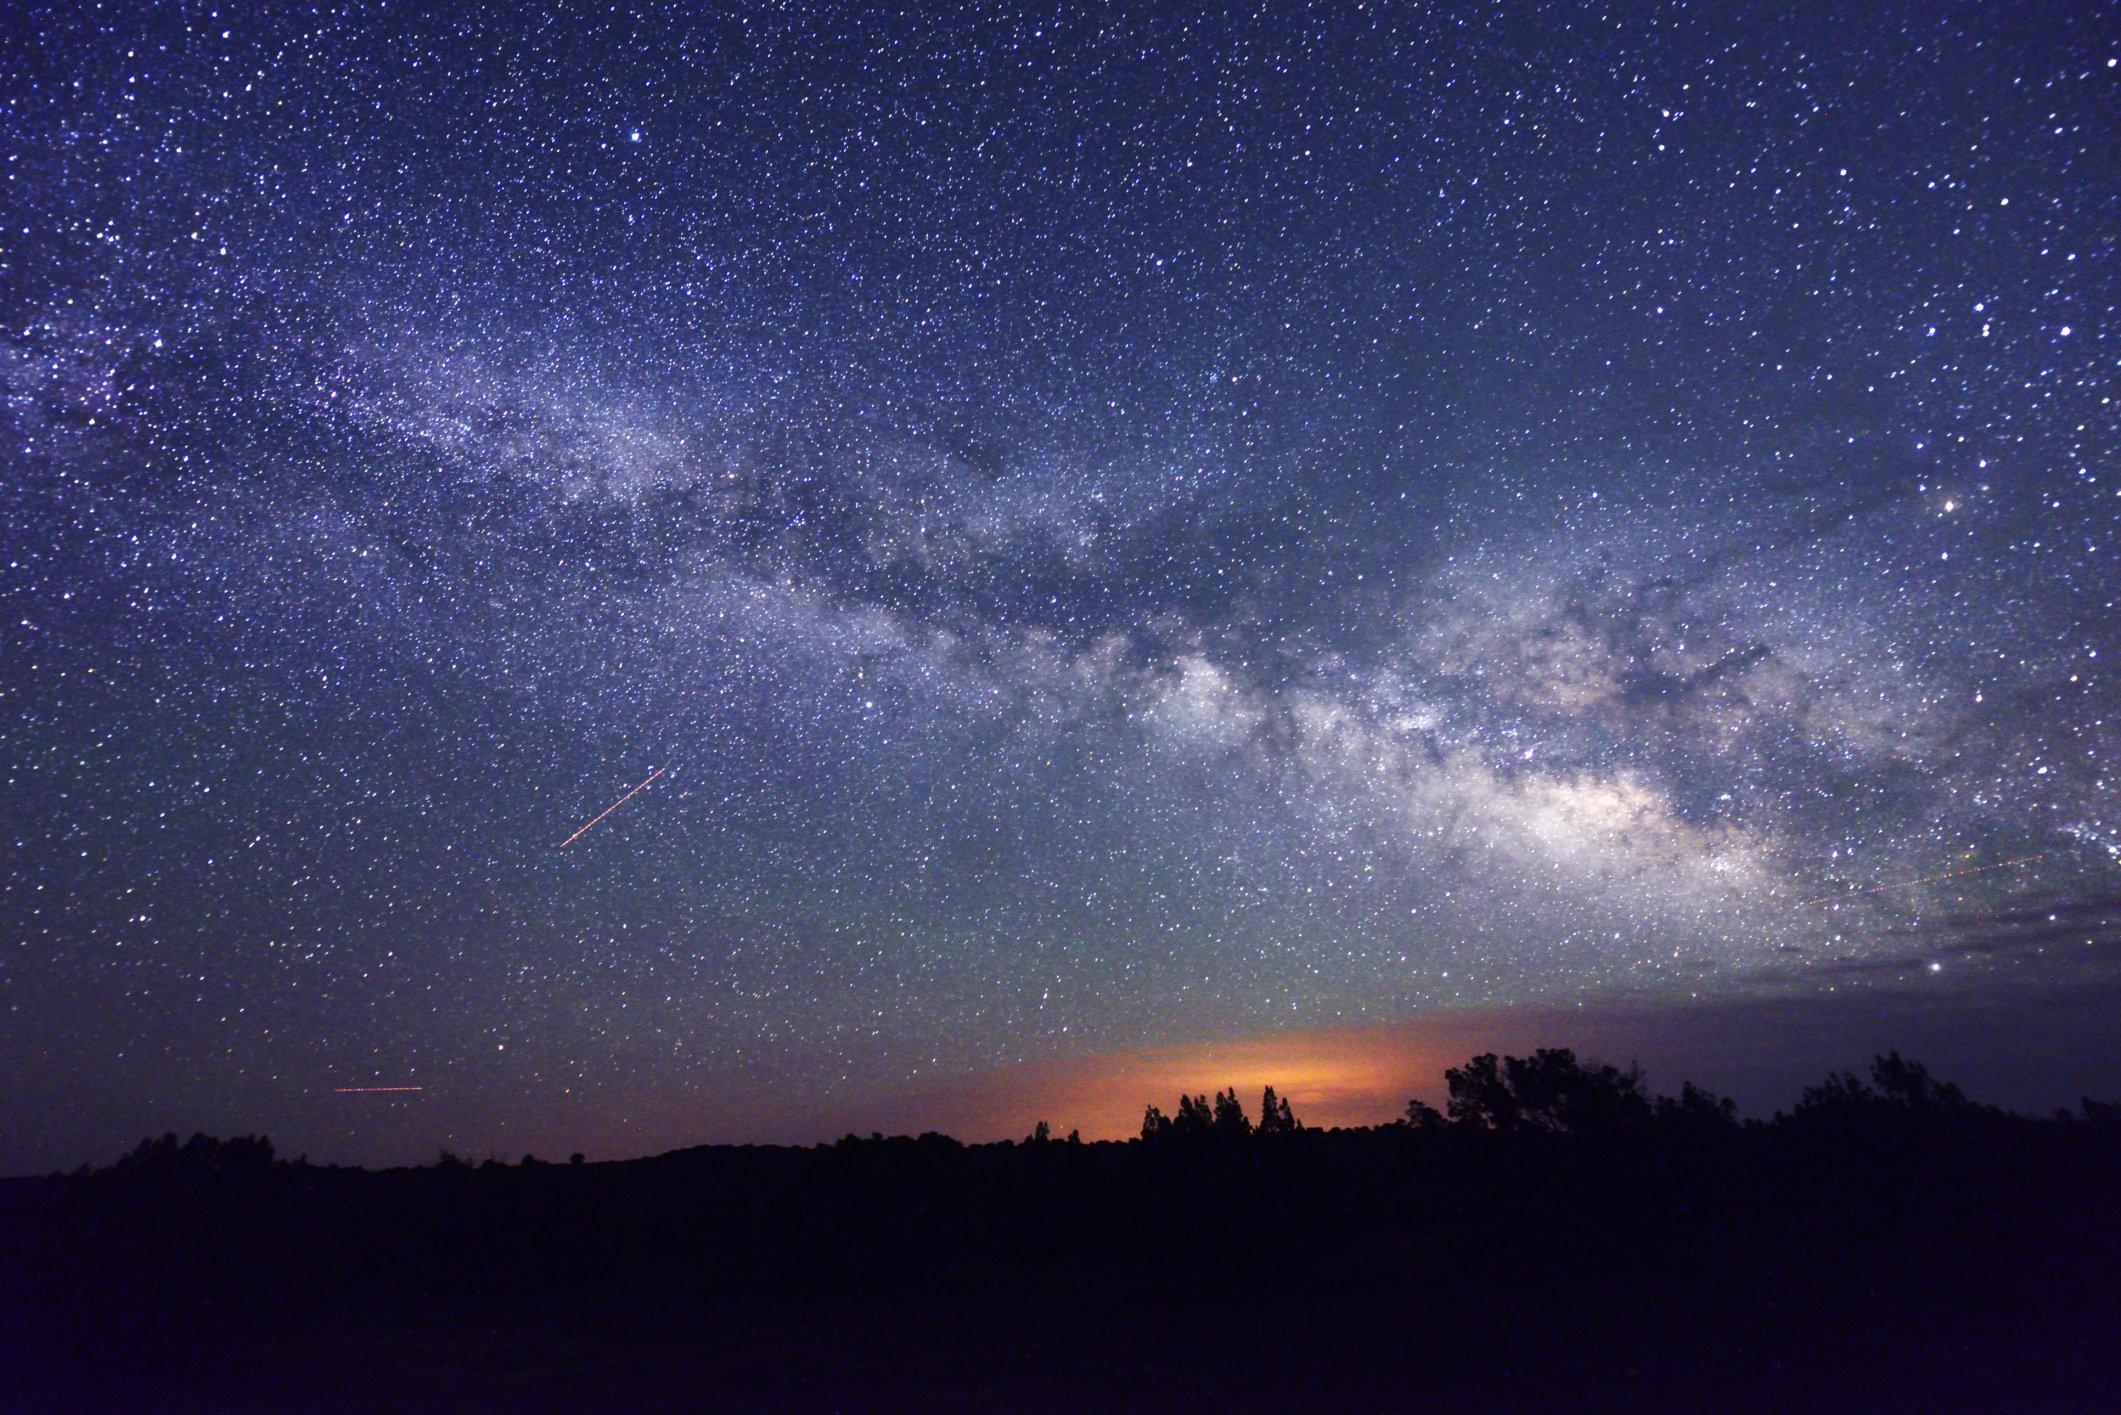 USA, Arizona, Sunset Crater National Monument, Night Sky